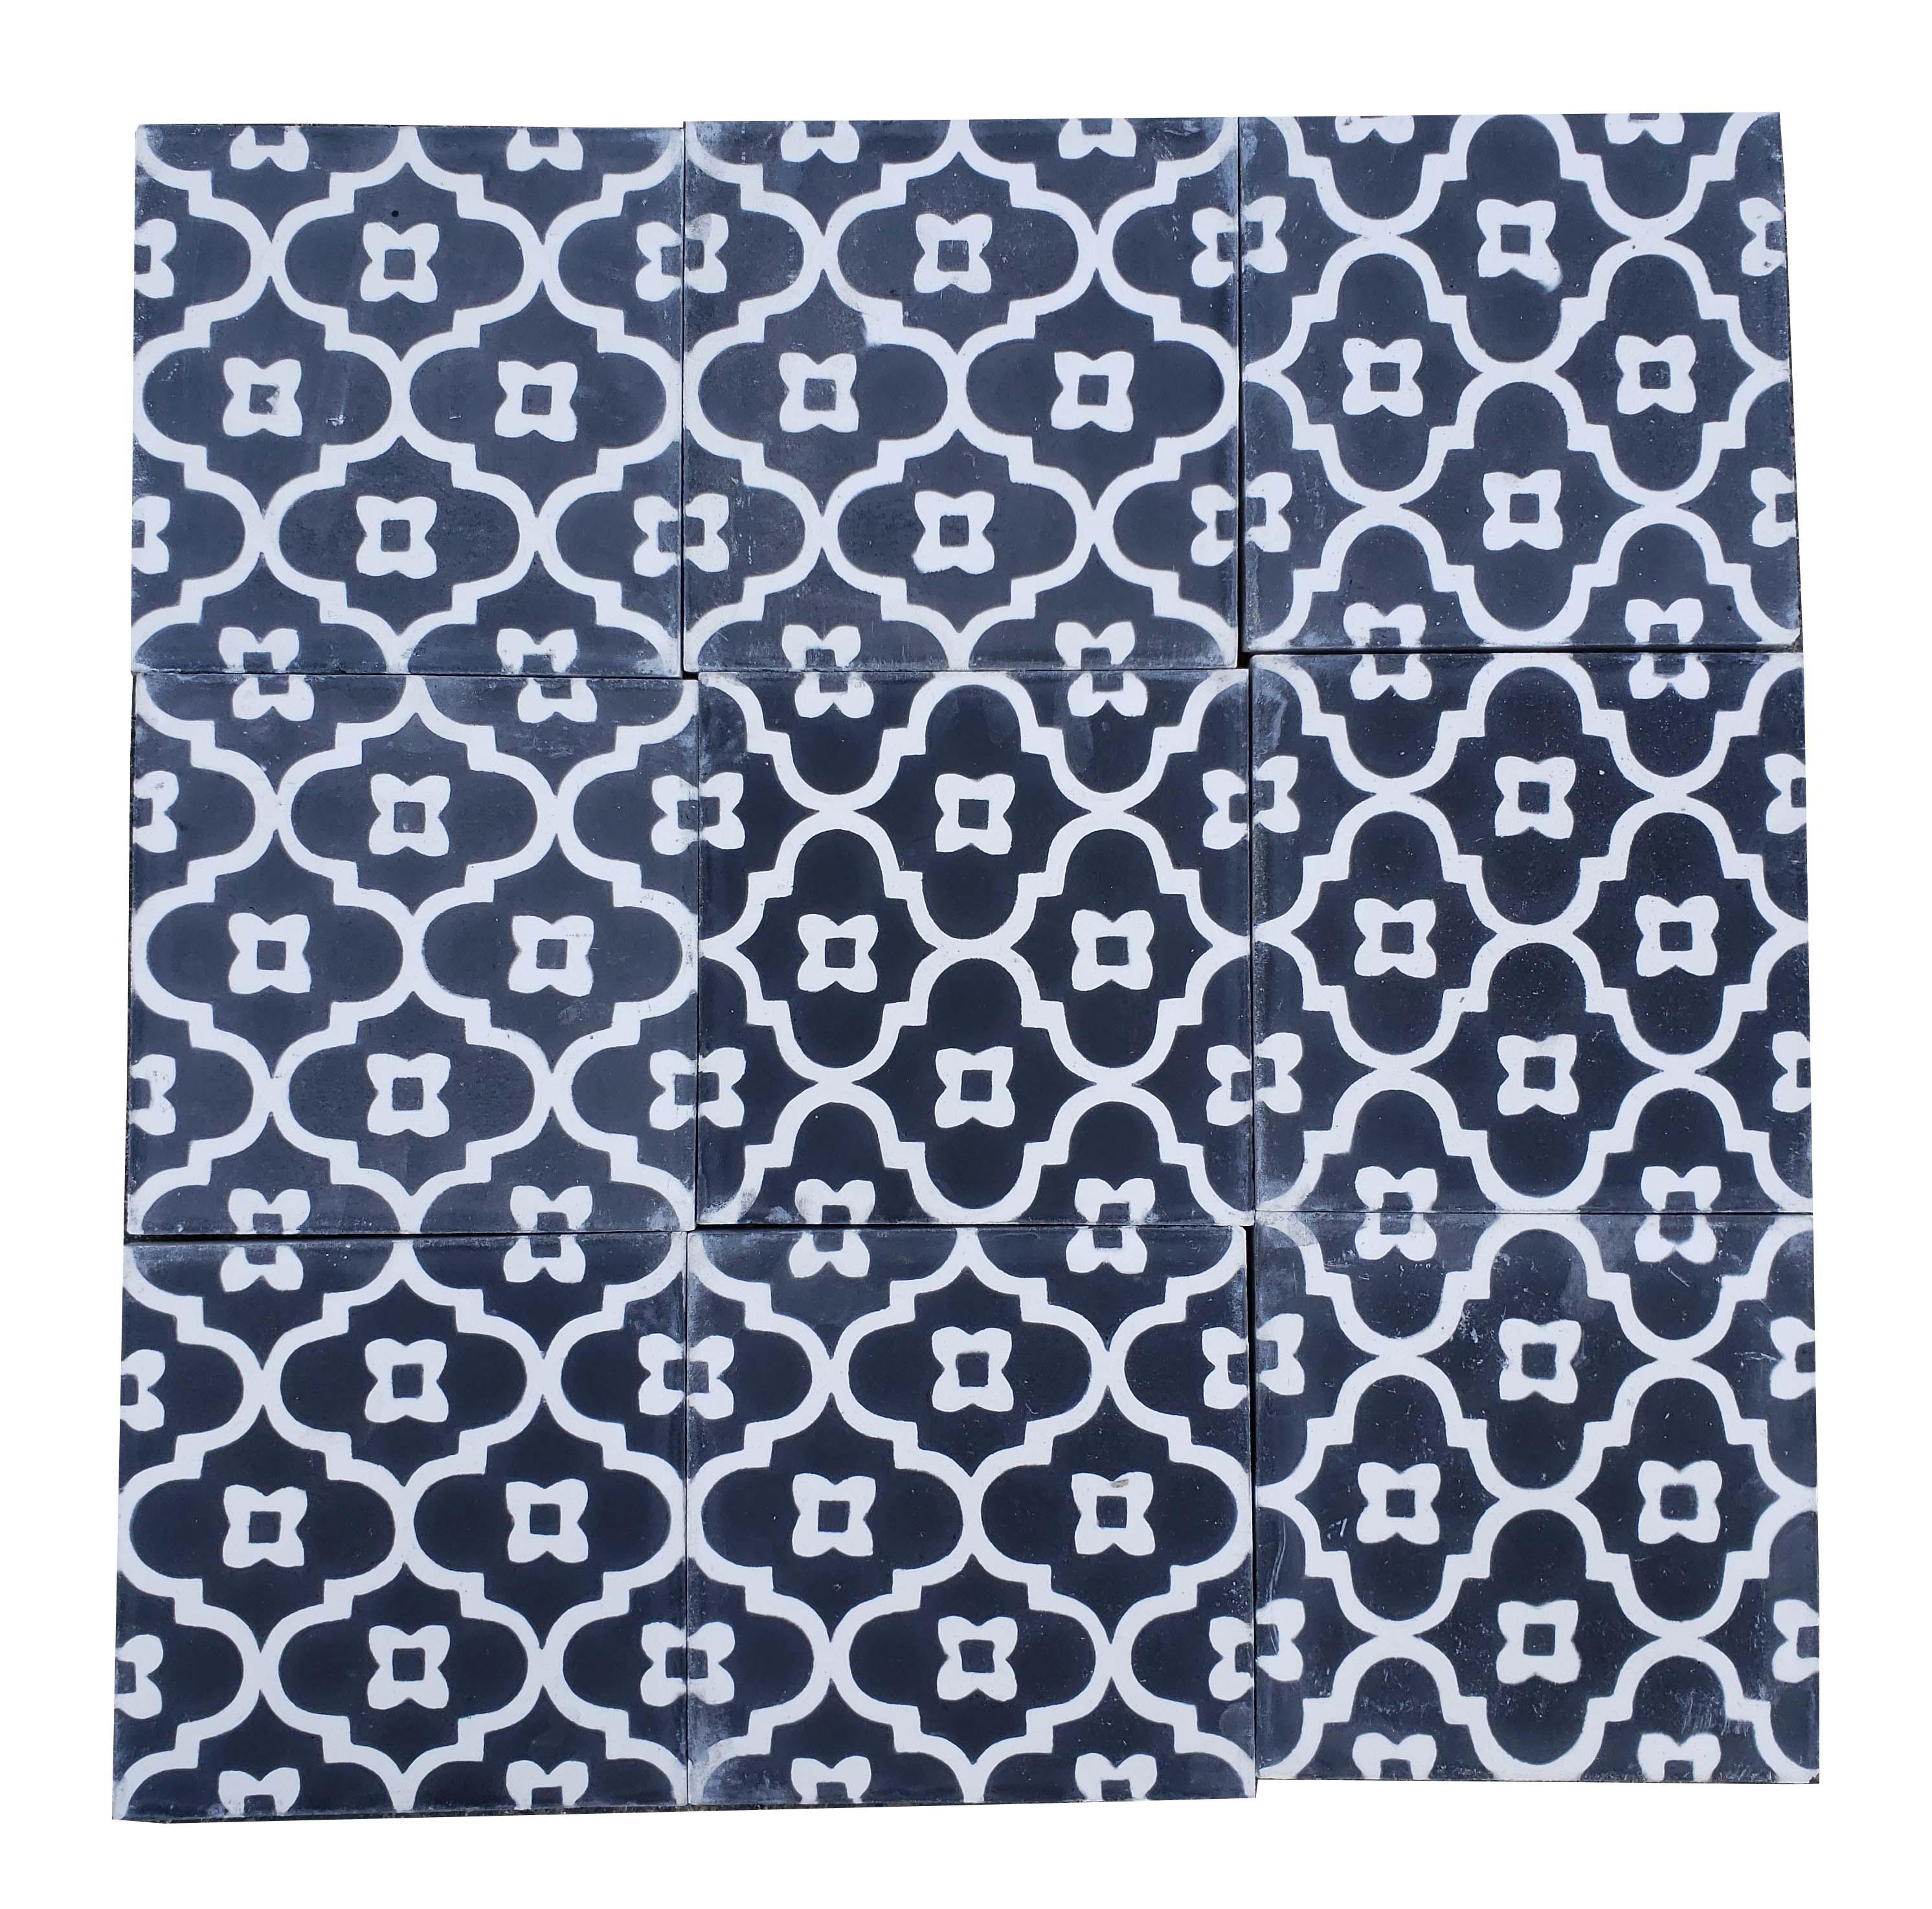 moroccan-cement-tile-manhattan-ct105.jpg